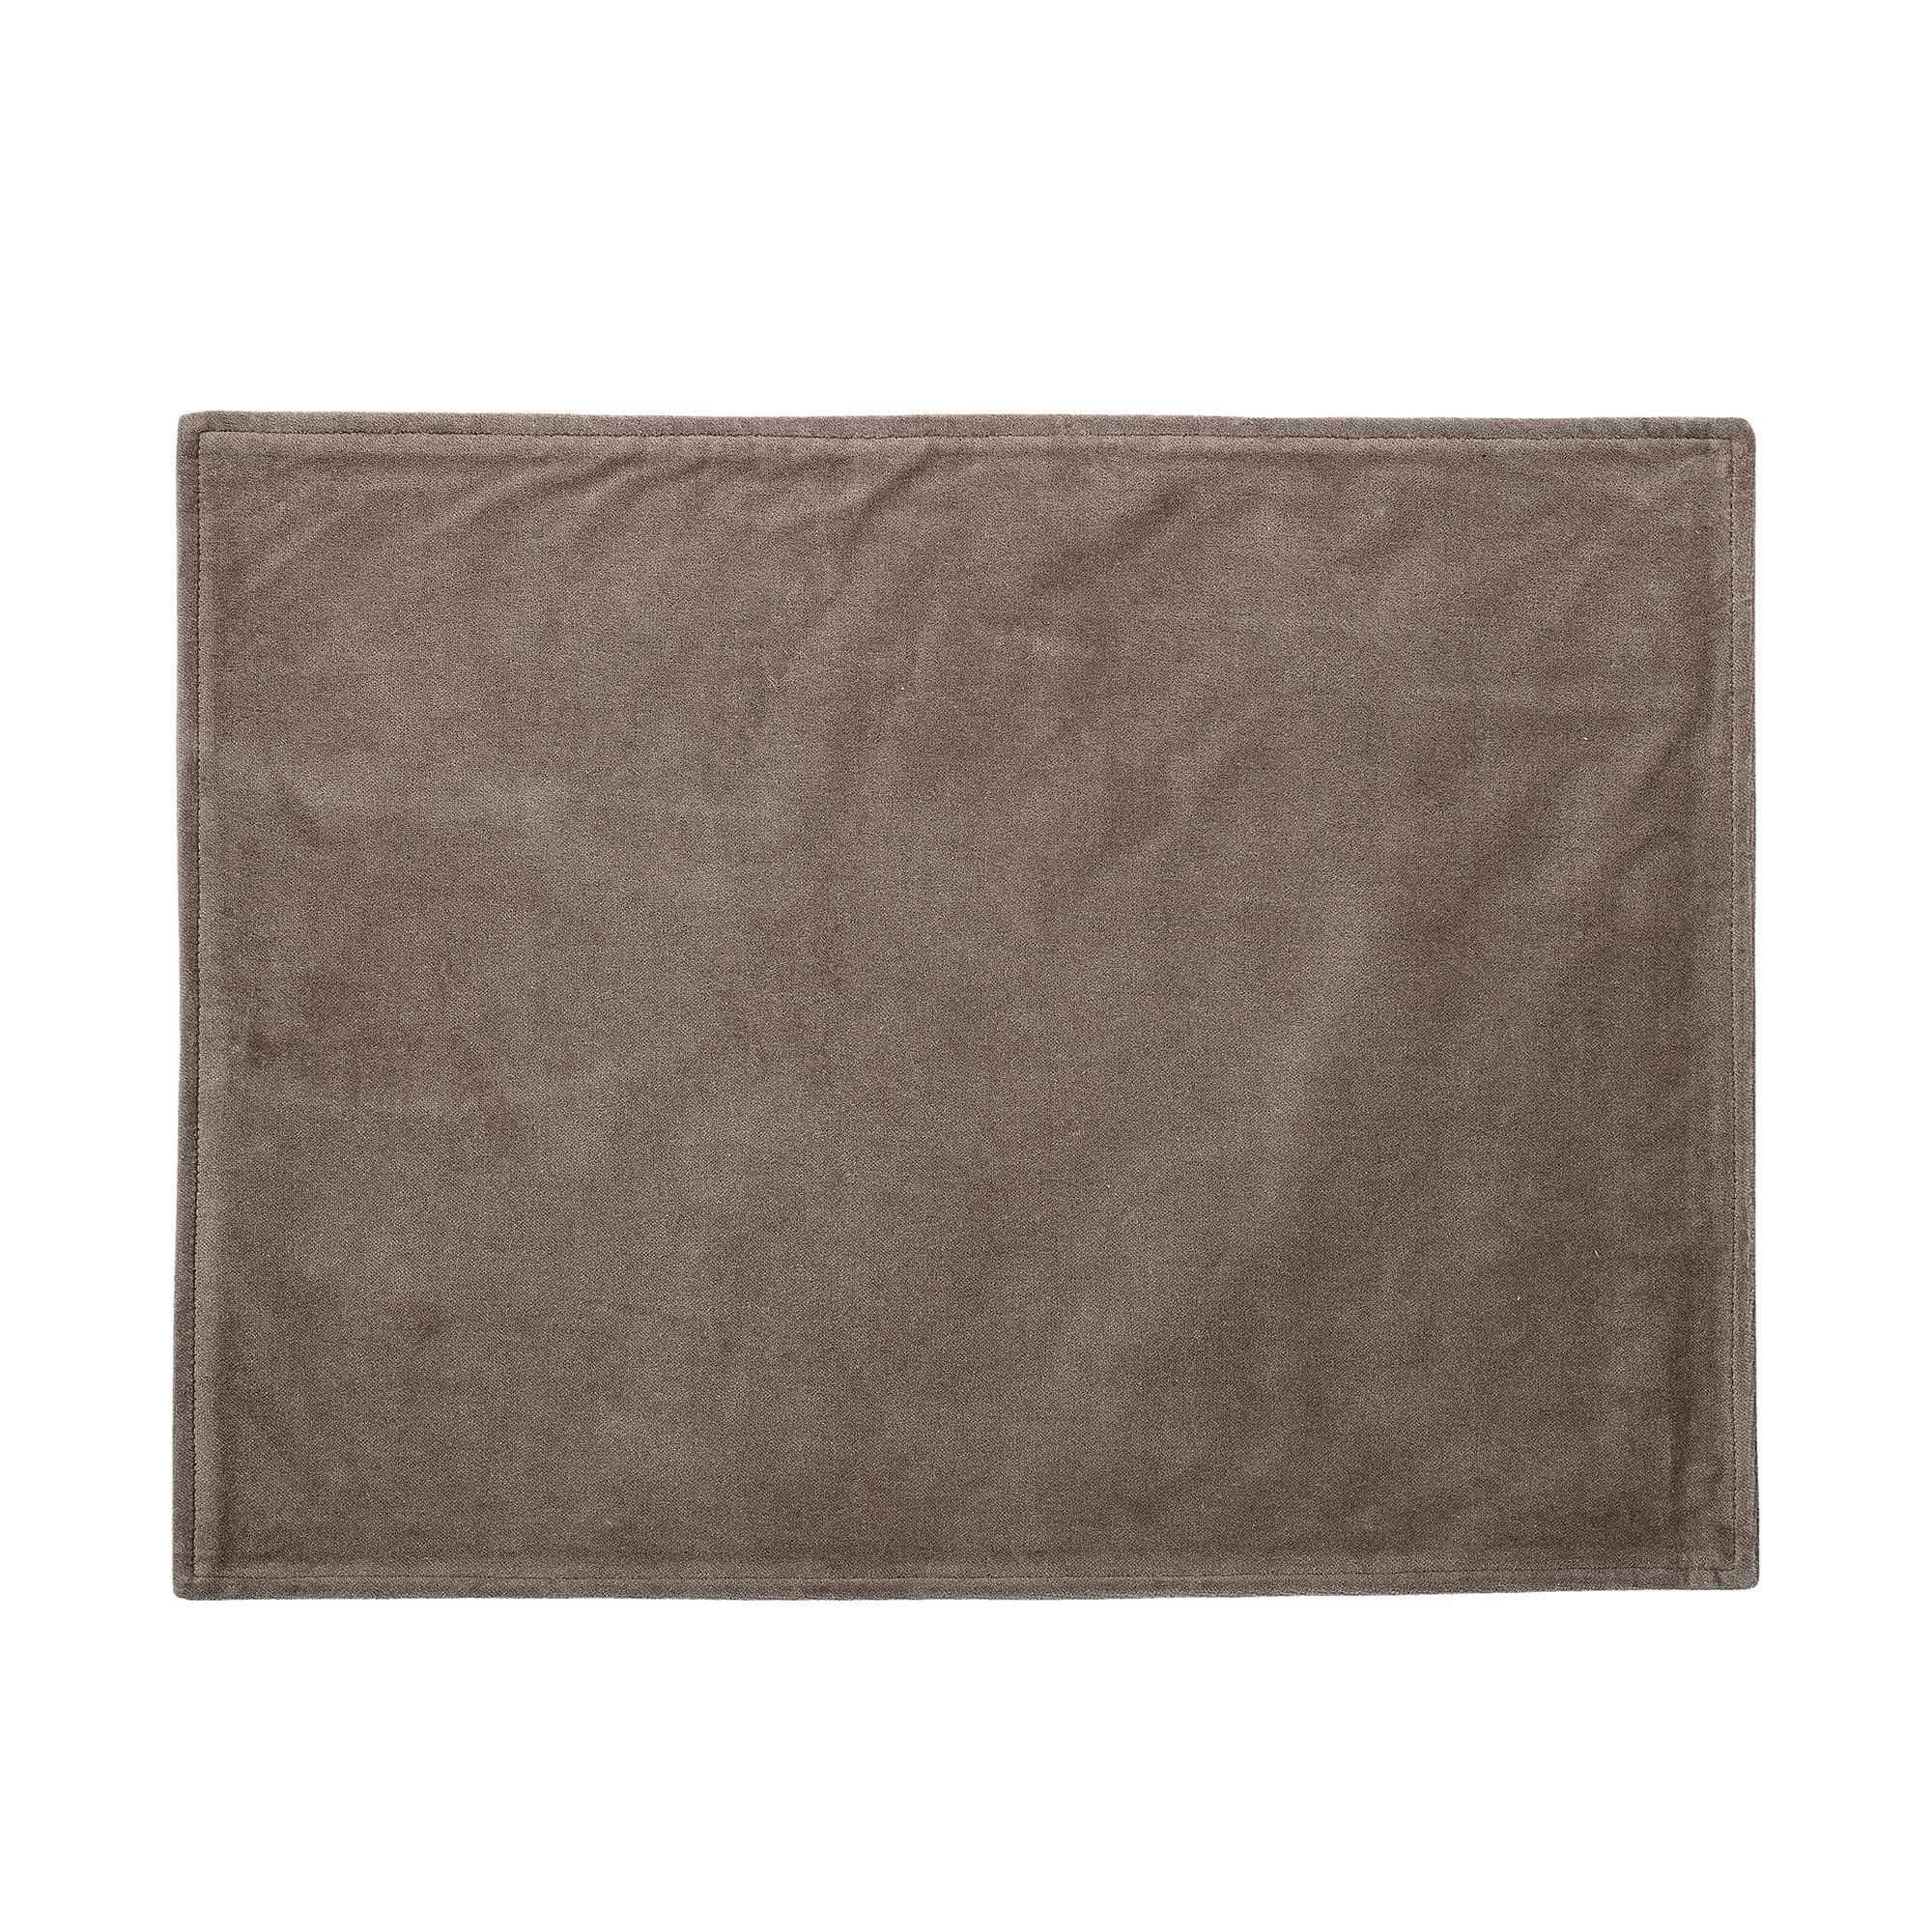 Kawa Dækkeserviet, brun – Bomuld